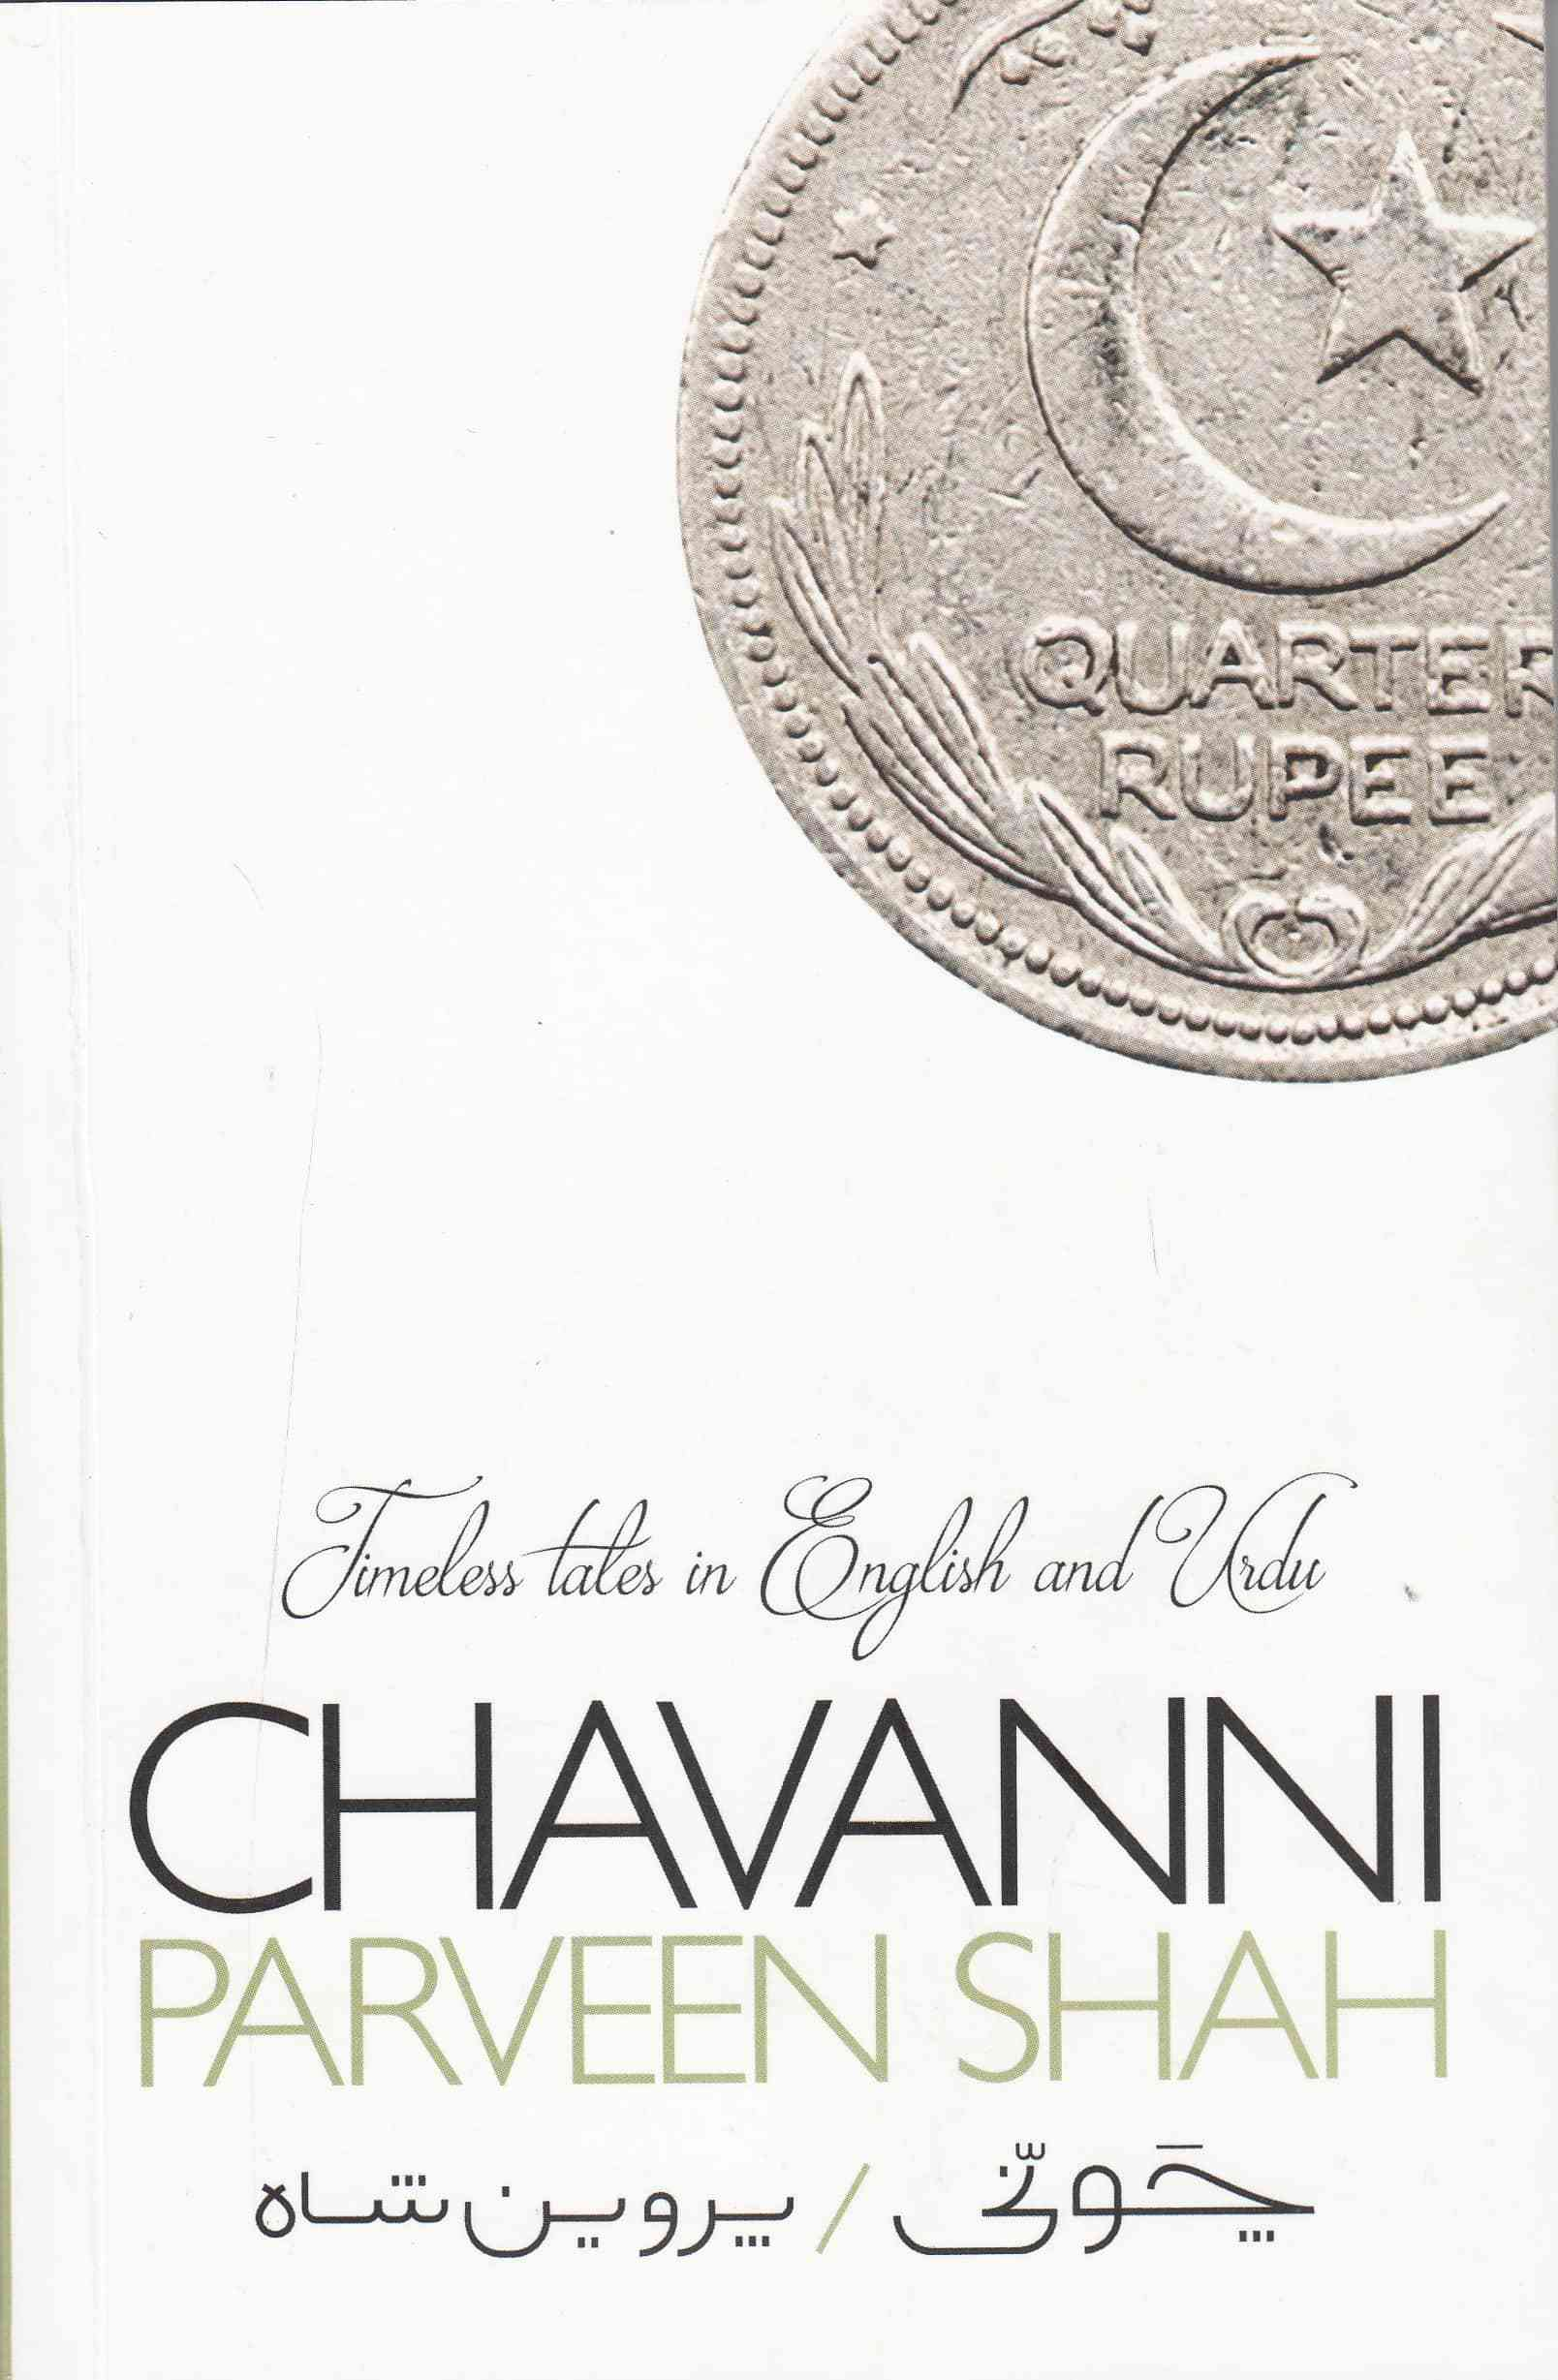 chavani